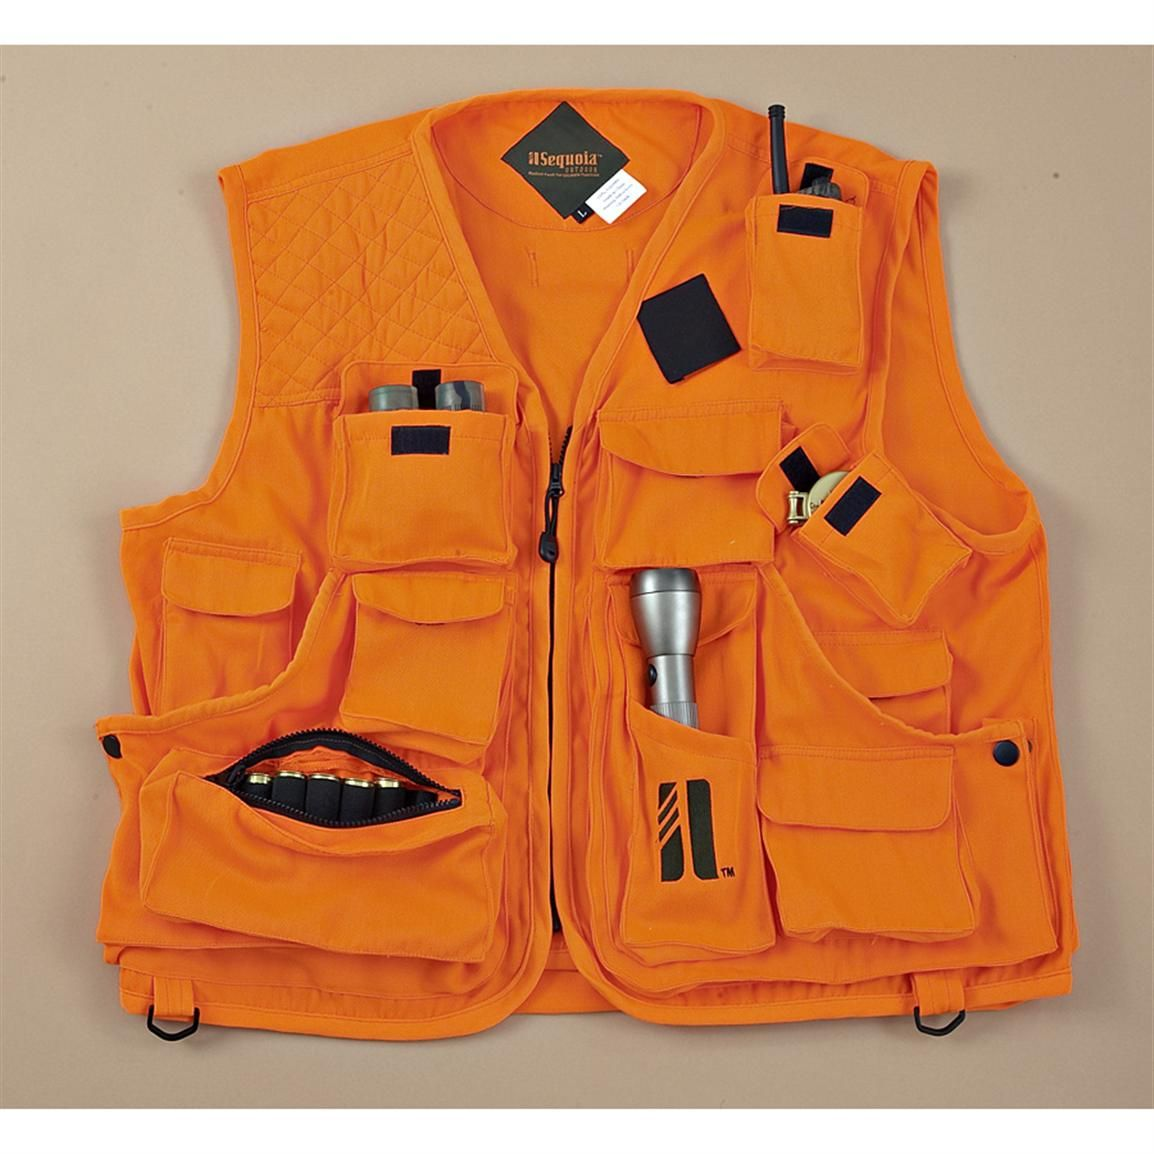 0bdcdb4d01b45 Sequoia Orion VestPak Orange Hunting Vest | hunting gear | Hunting ...